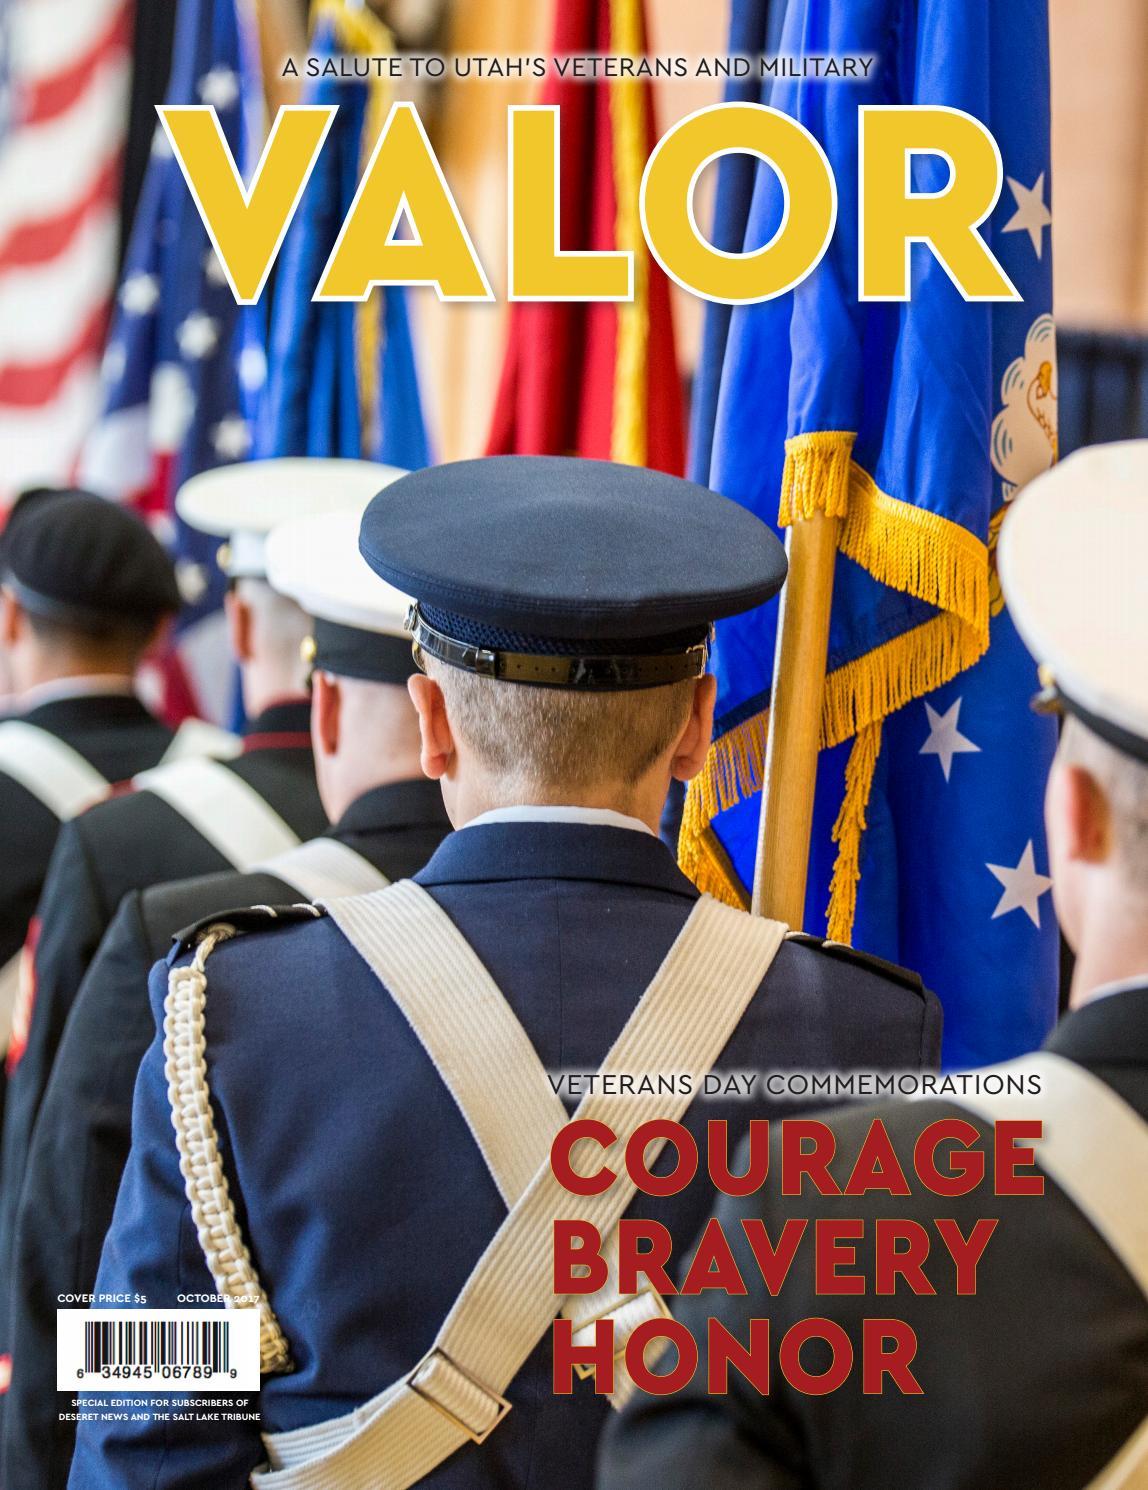 d0e340110c24f Utah Valor Magazine October 2017 by Utah Media Group - issuu